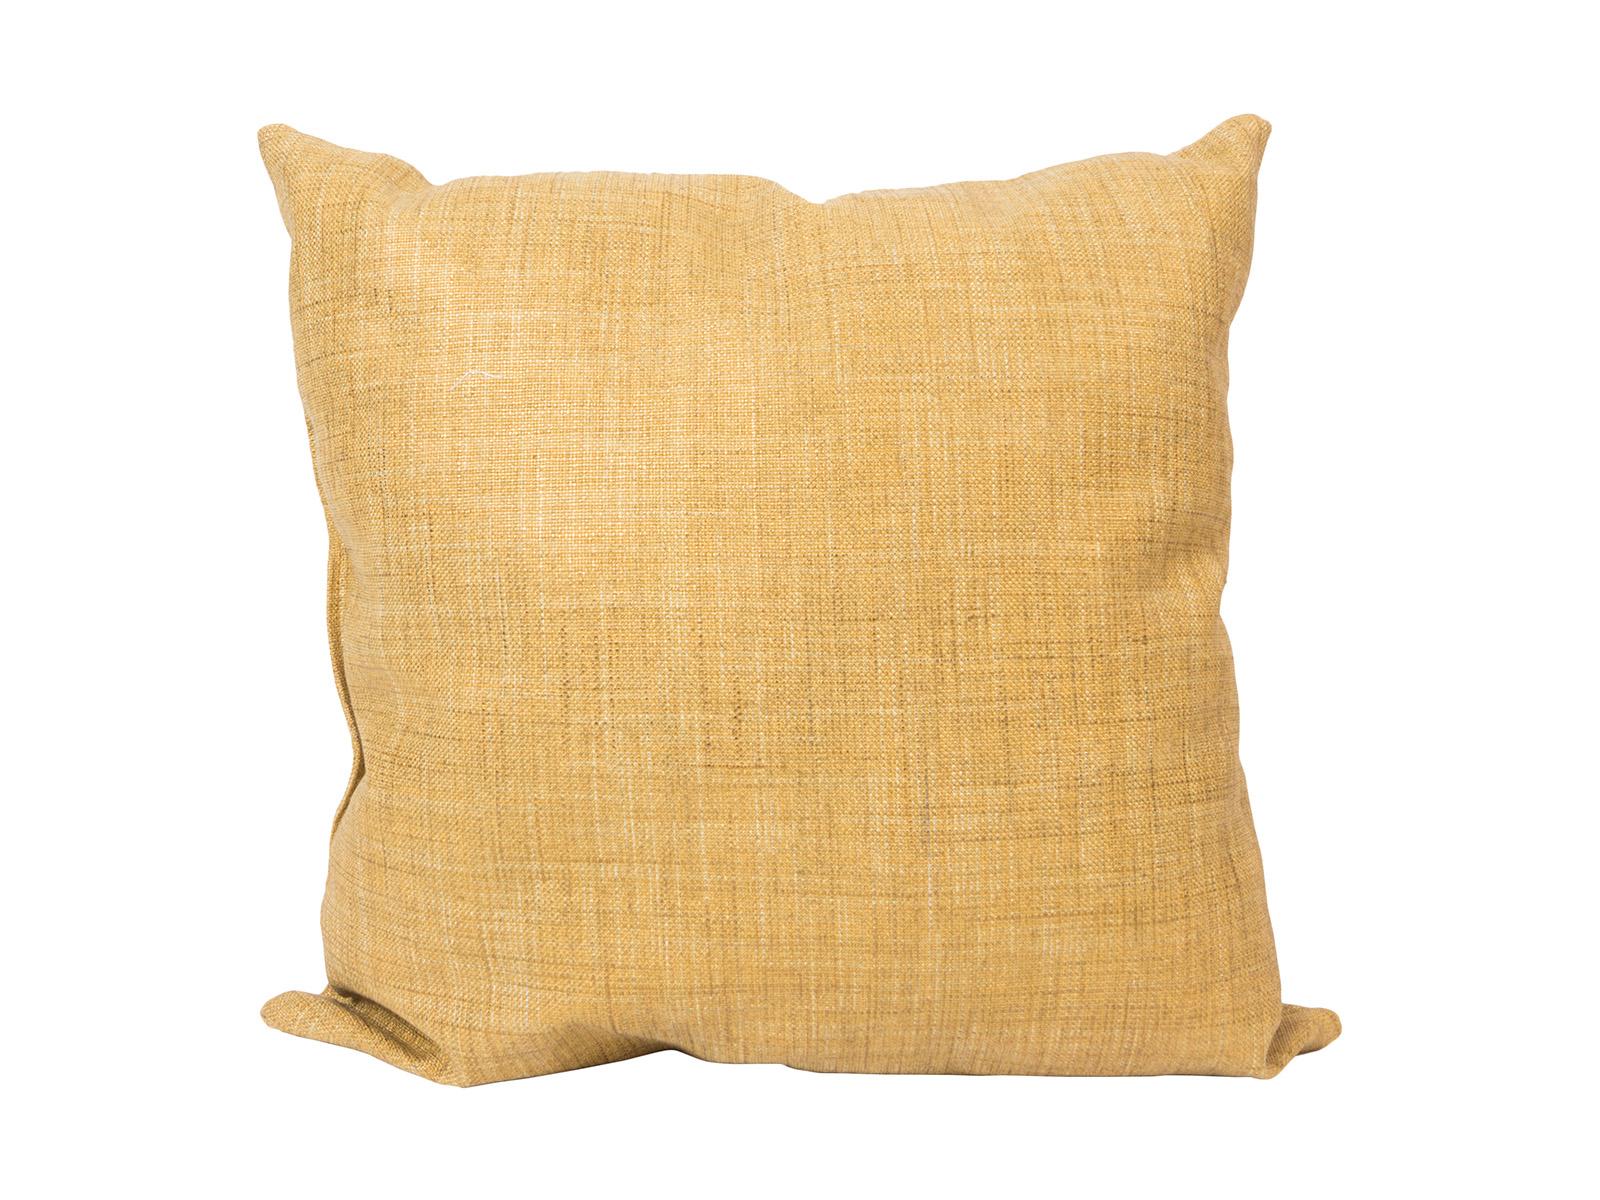 Подушка TahitiПодушки декоративные<br>Декоративная подушка<br>